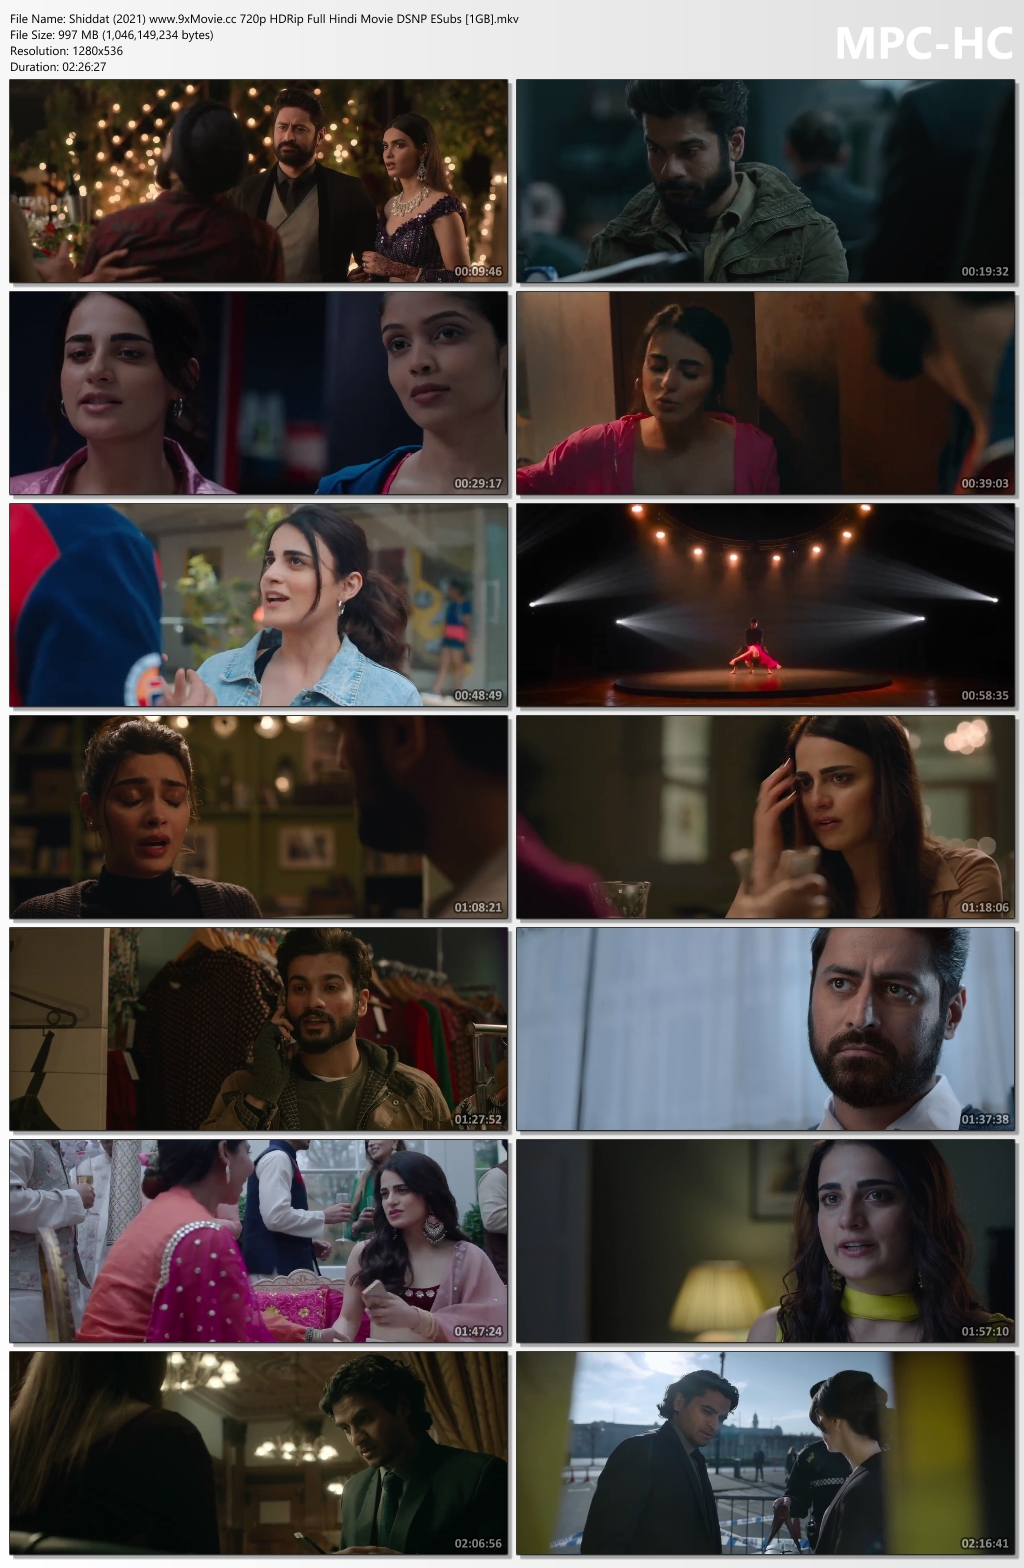 Shiddat-2021-www-9x-Movie-cc-720p-HDRip-Full-Hindi-Movie-DSNP-ESubs-1-GB-mkv